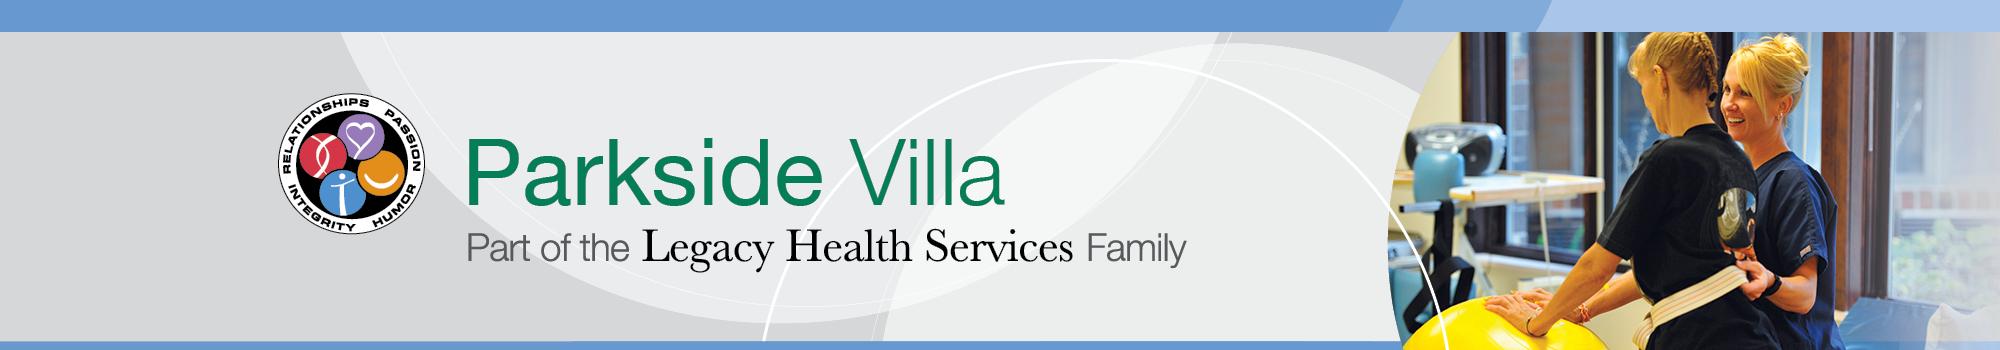 Parkside-Villa-Banners-1